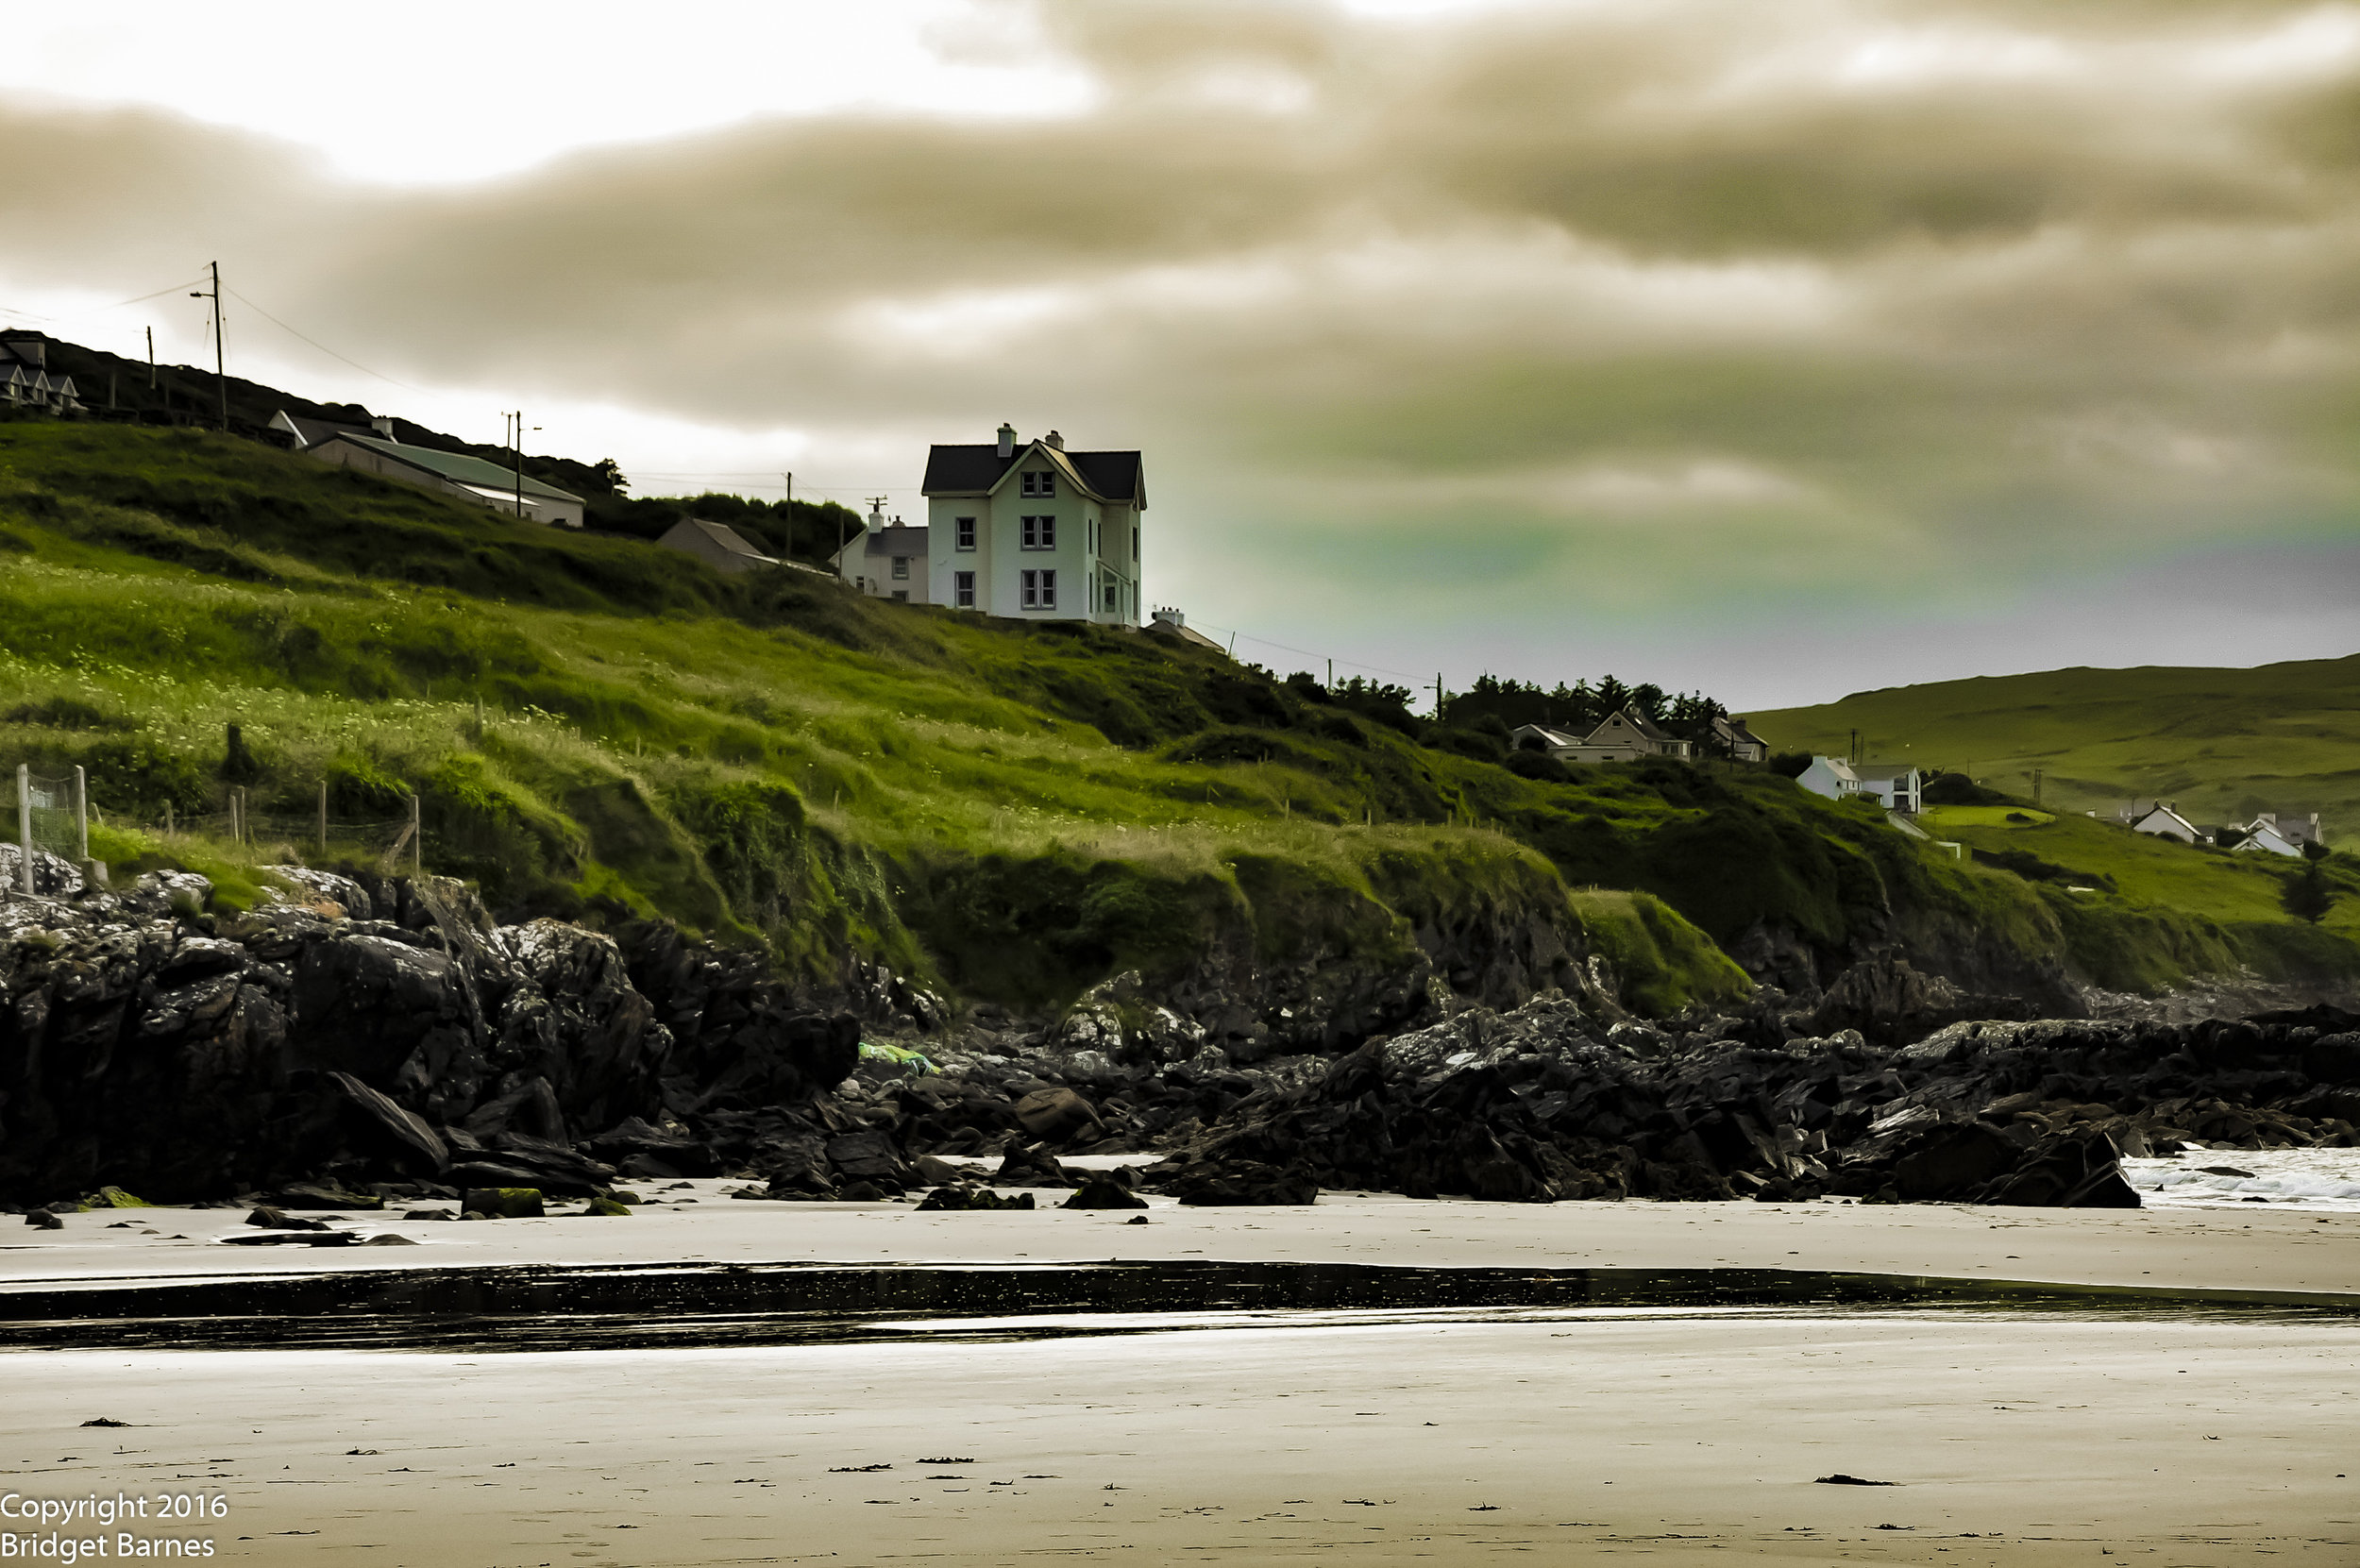 Portnoo Beach on the Wild Atlantic Way in Co. Donegal